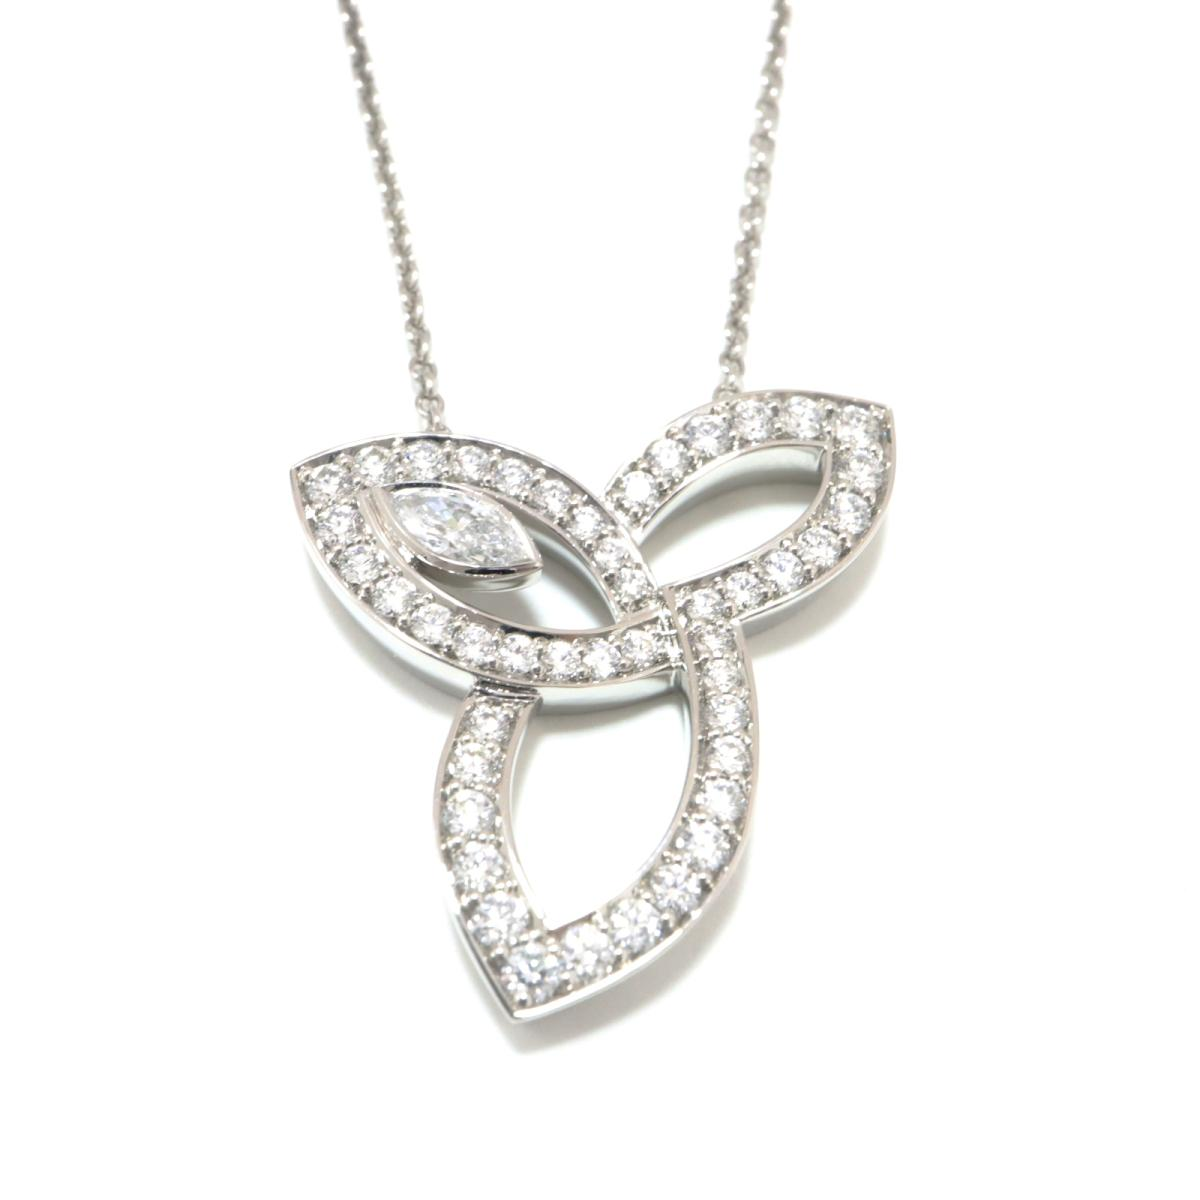 Jewel Tie Sterling Silver Infinity Slide Pendant Charm